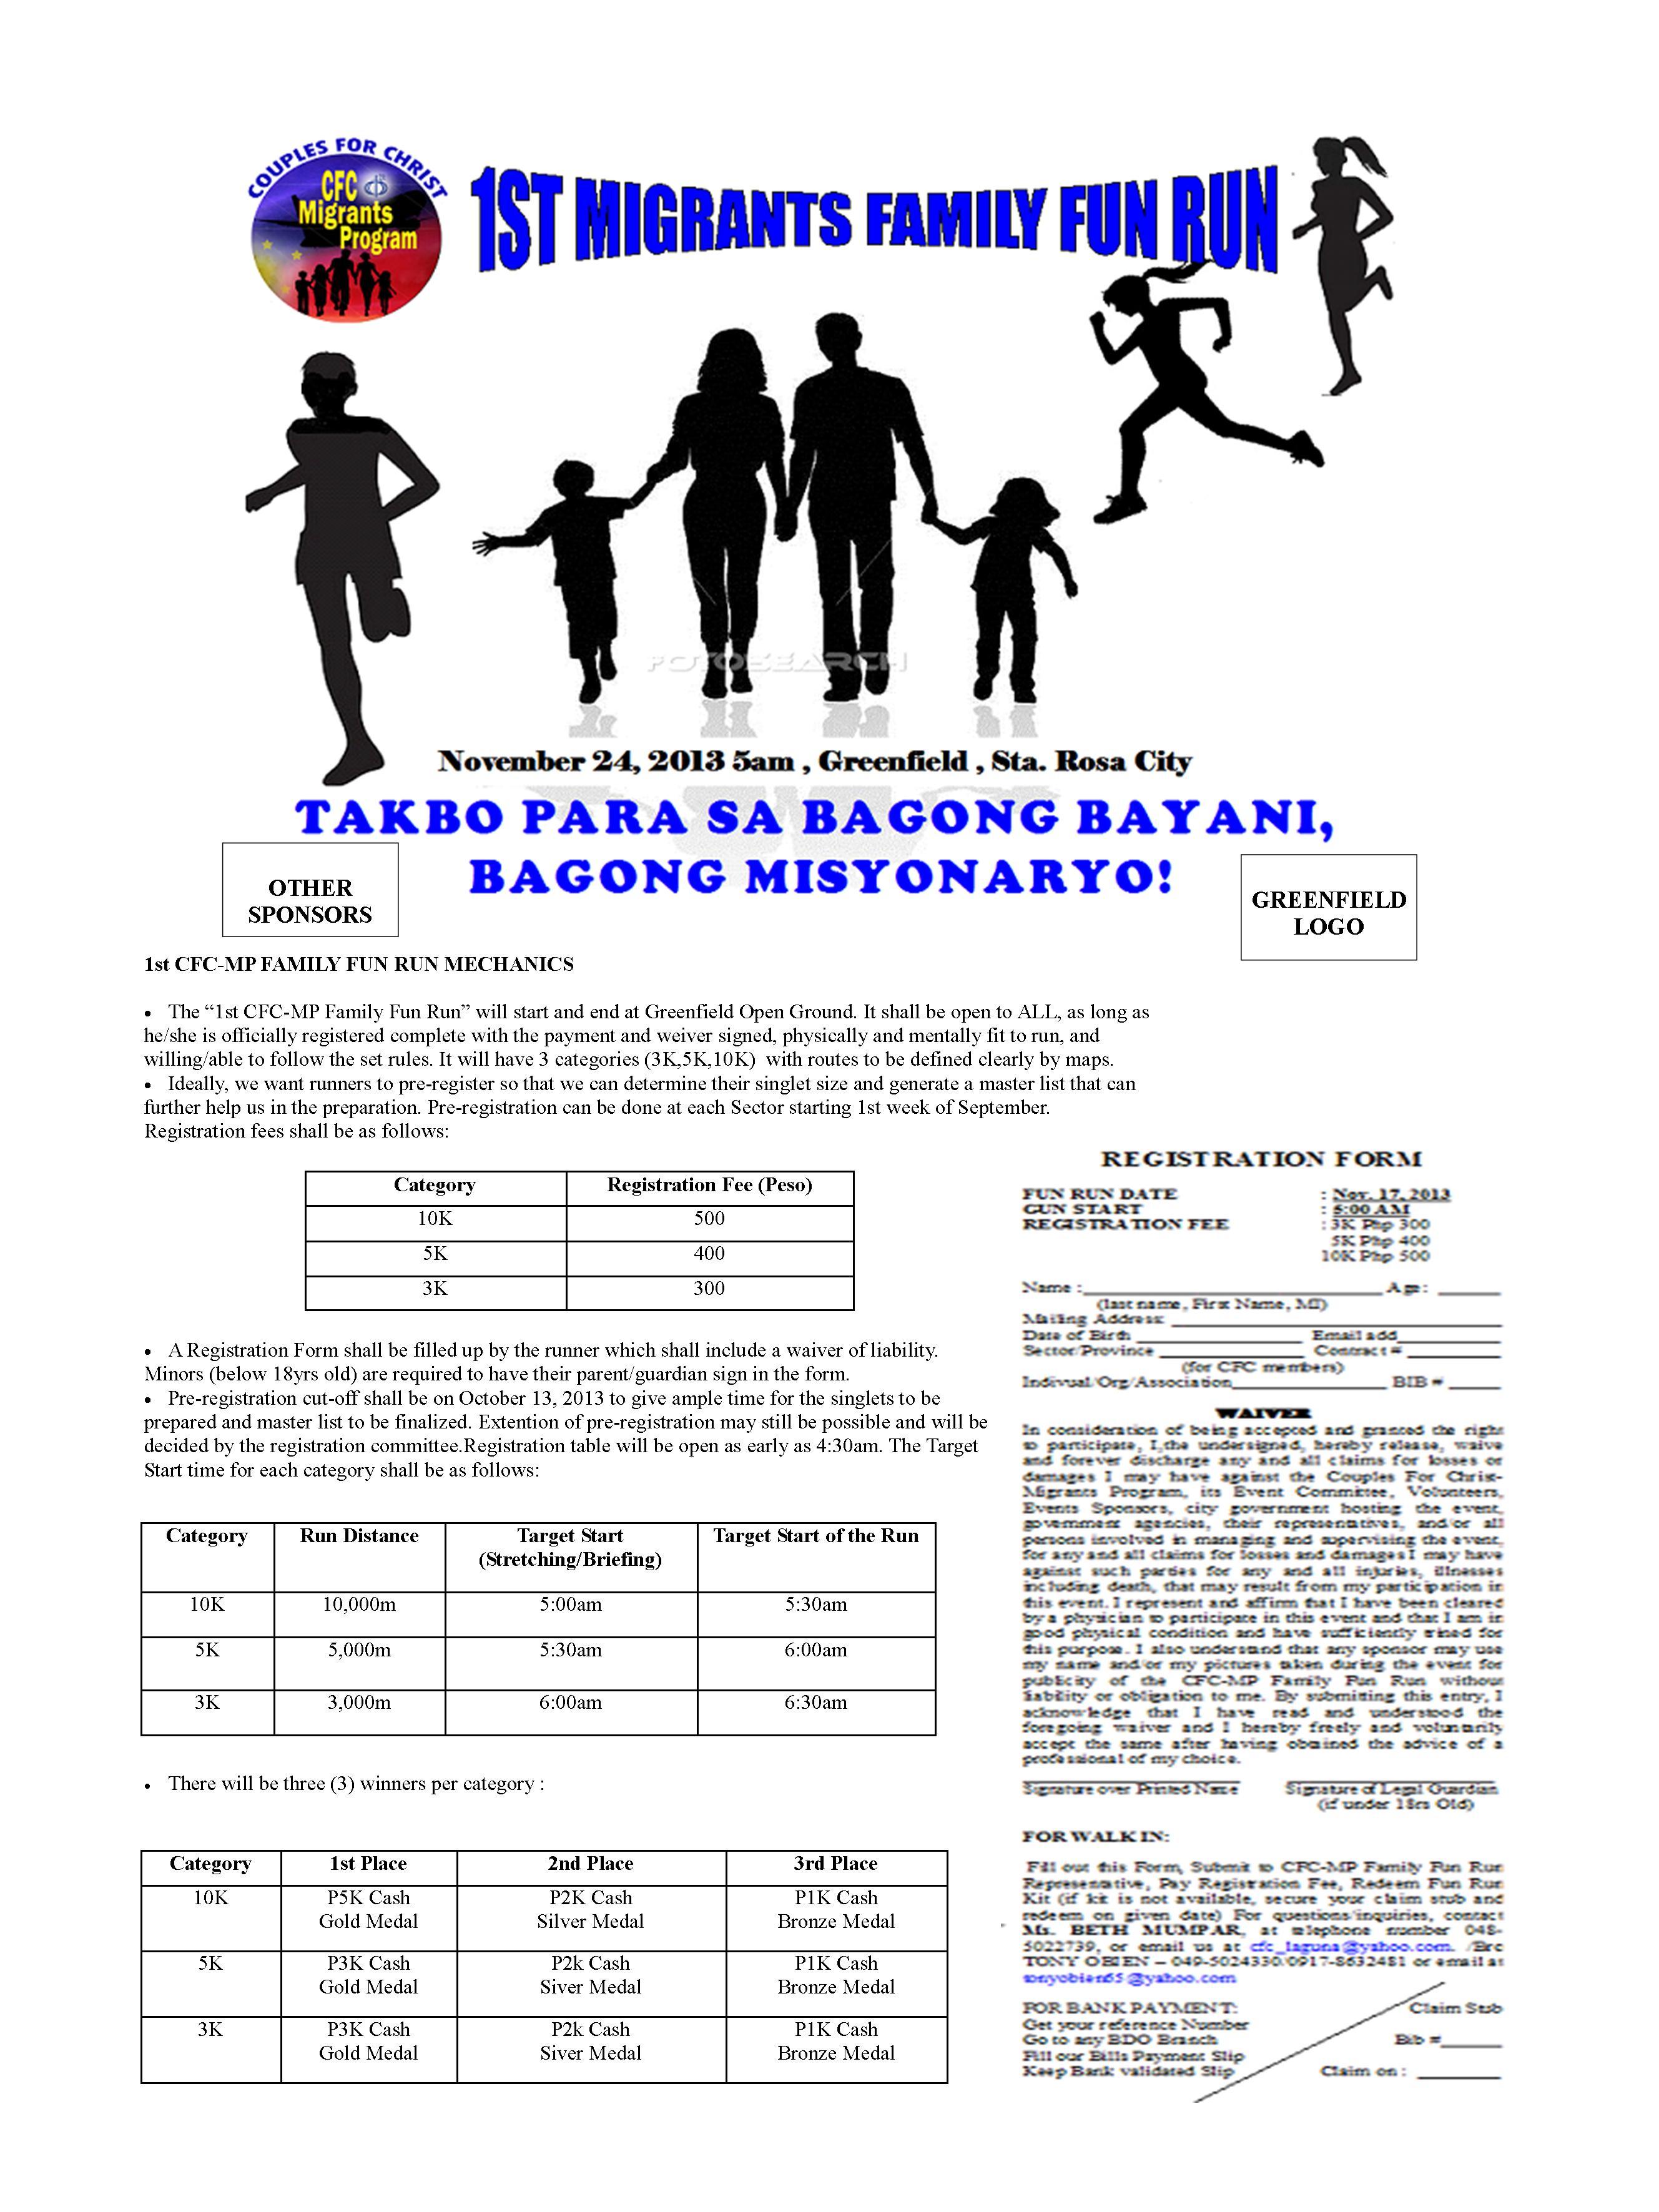 migrants-family-fun-run-2013-poster